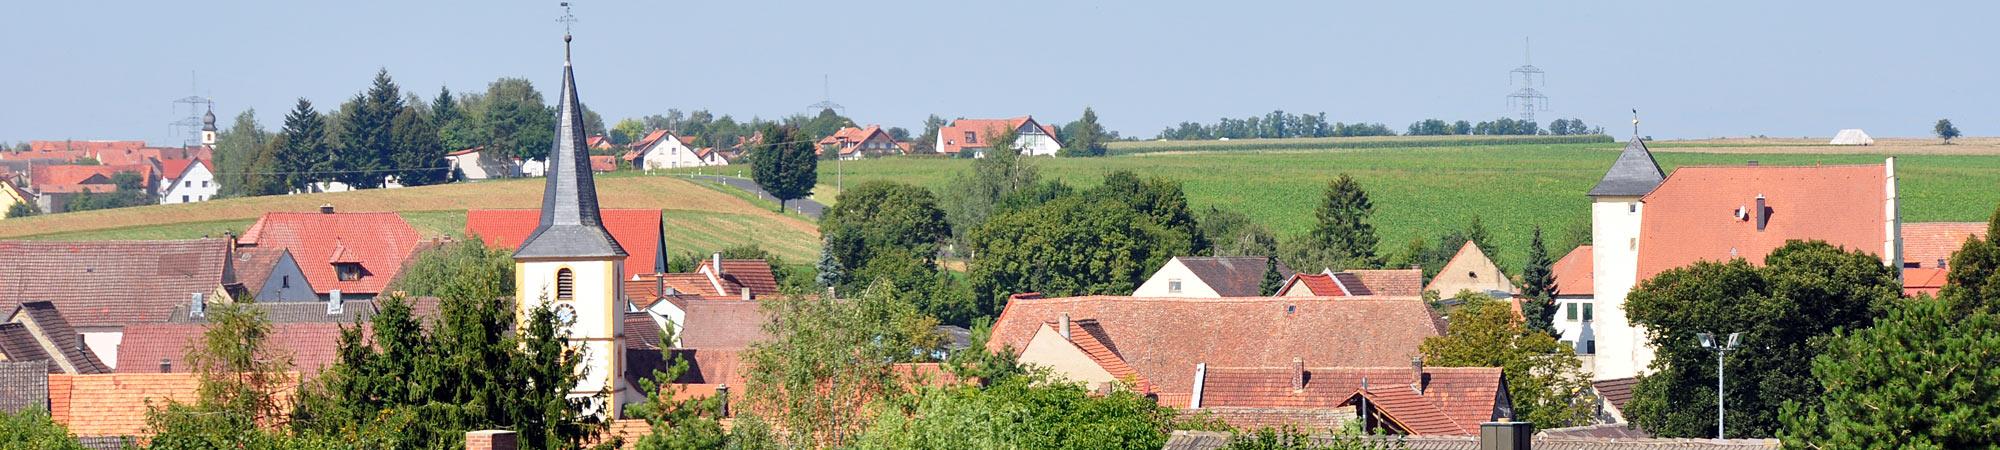 Bibergau-Effeldorf-DSC_9887